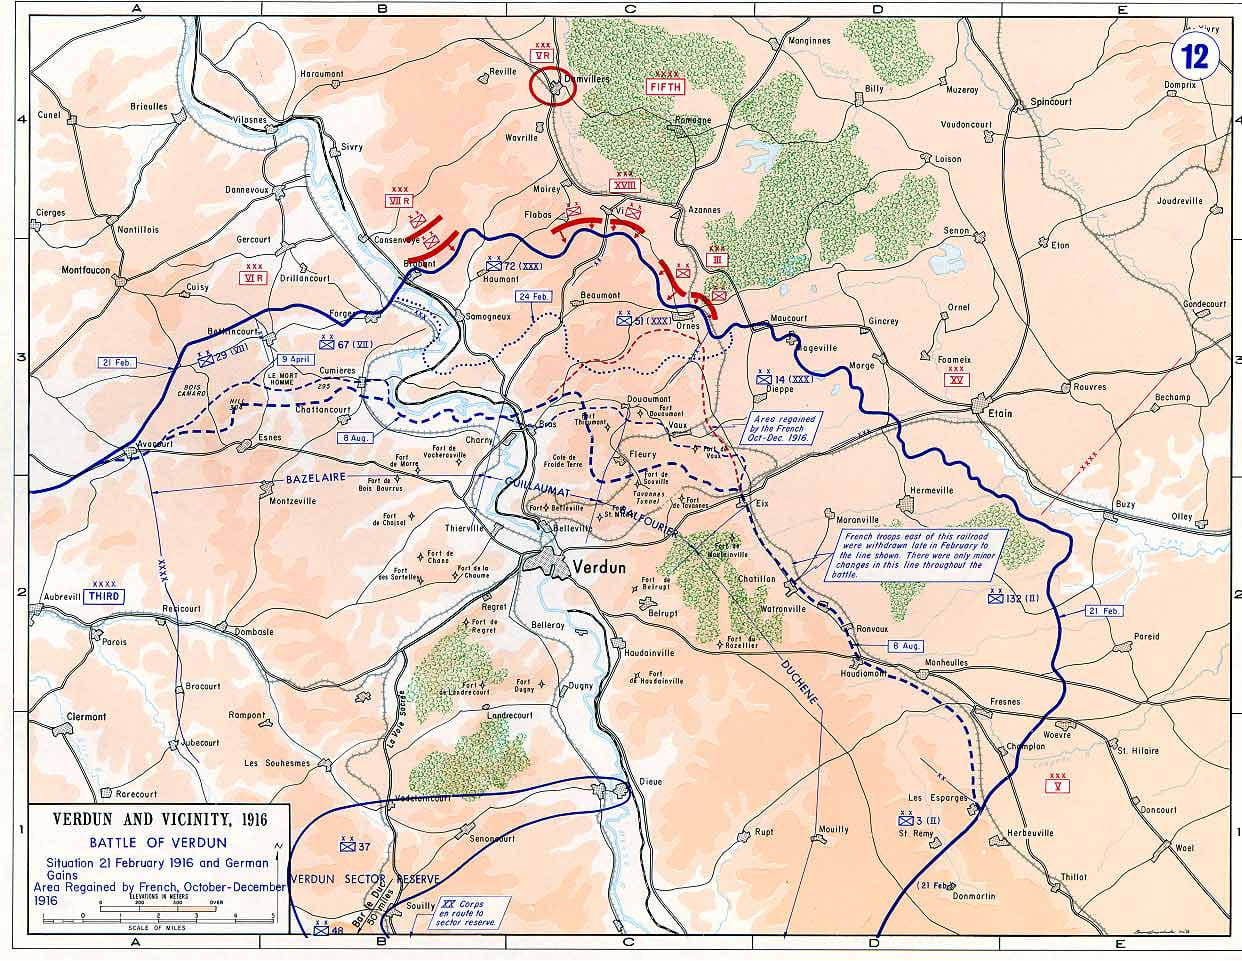 carte de la bataille de verdun Bataille de Verdun : photos, dates clés, carte, bilan Retour